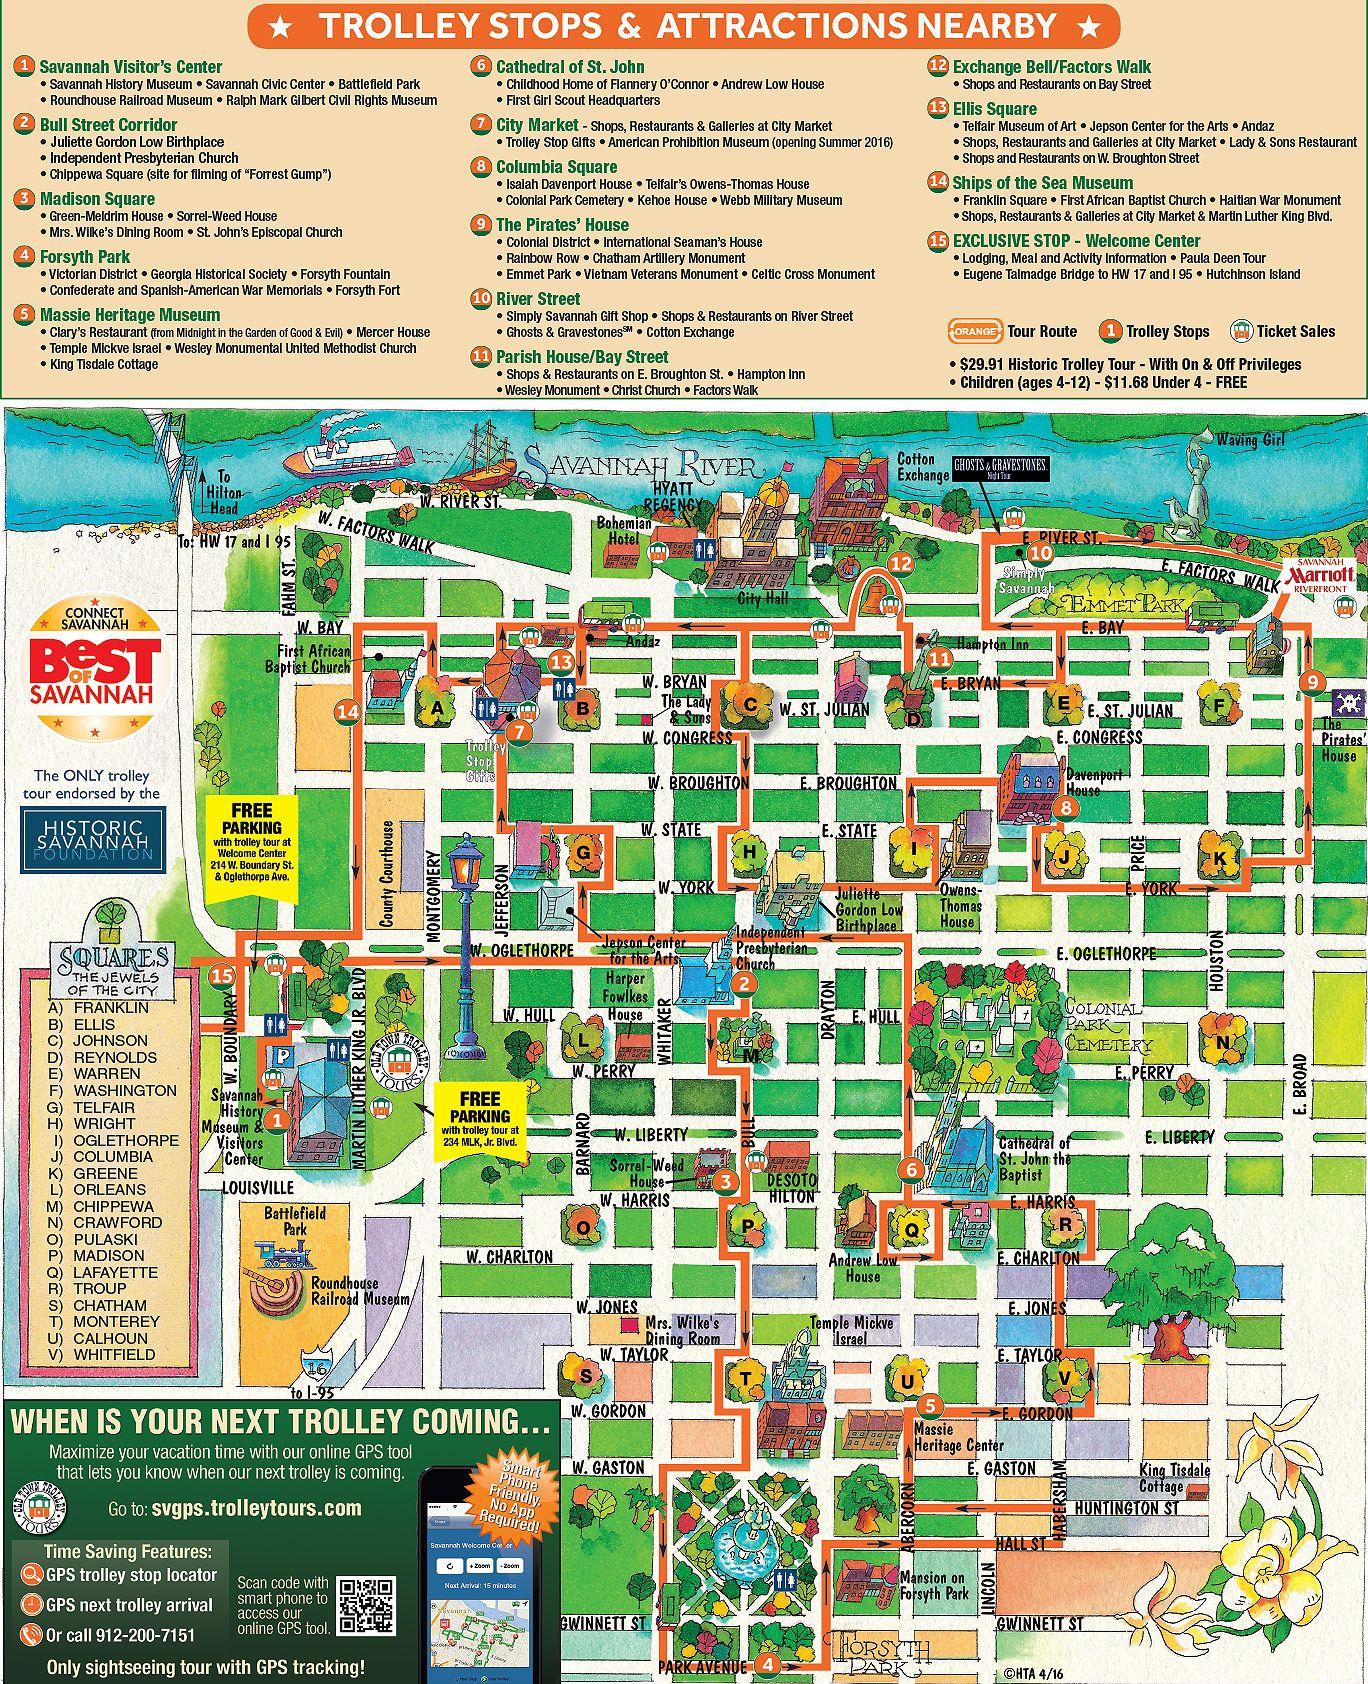 Savannah Old Town Trolley route map | Savannah Georgia ... on savannah hurricane map, savannah georgia travel guide, printable savannah downtown map, savannah loft bed, savannah water map, savannah ga, savannah travel map, savannah bus map, savannah shopping map, savannah retail map, savannah visitors map, savannah history map, savannah trolley tours, savannah hotel map, savannah landmark historic district, savannah tourism, savannah park map, colonial savannah map, savannah riverwalk restaurants, savannah georgia map,